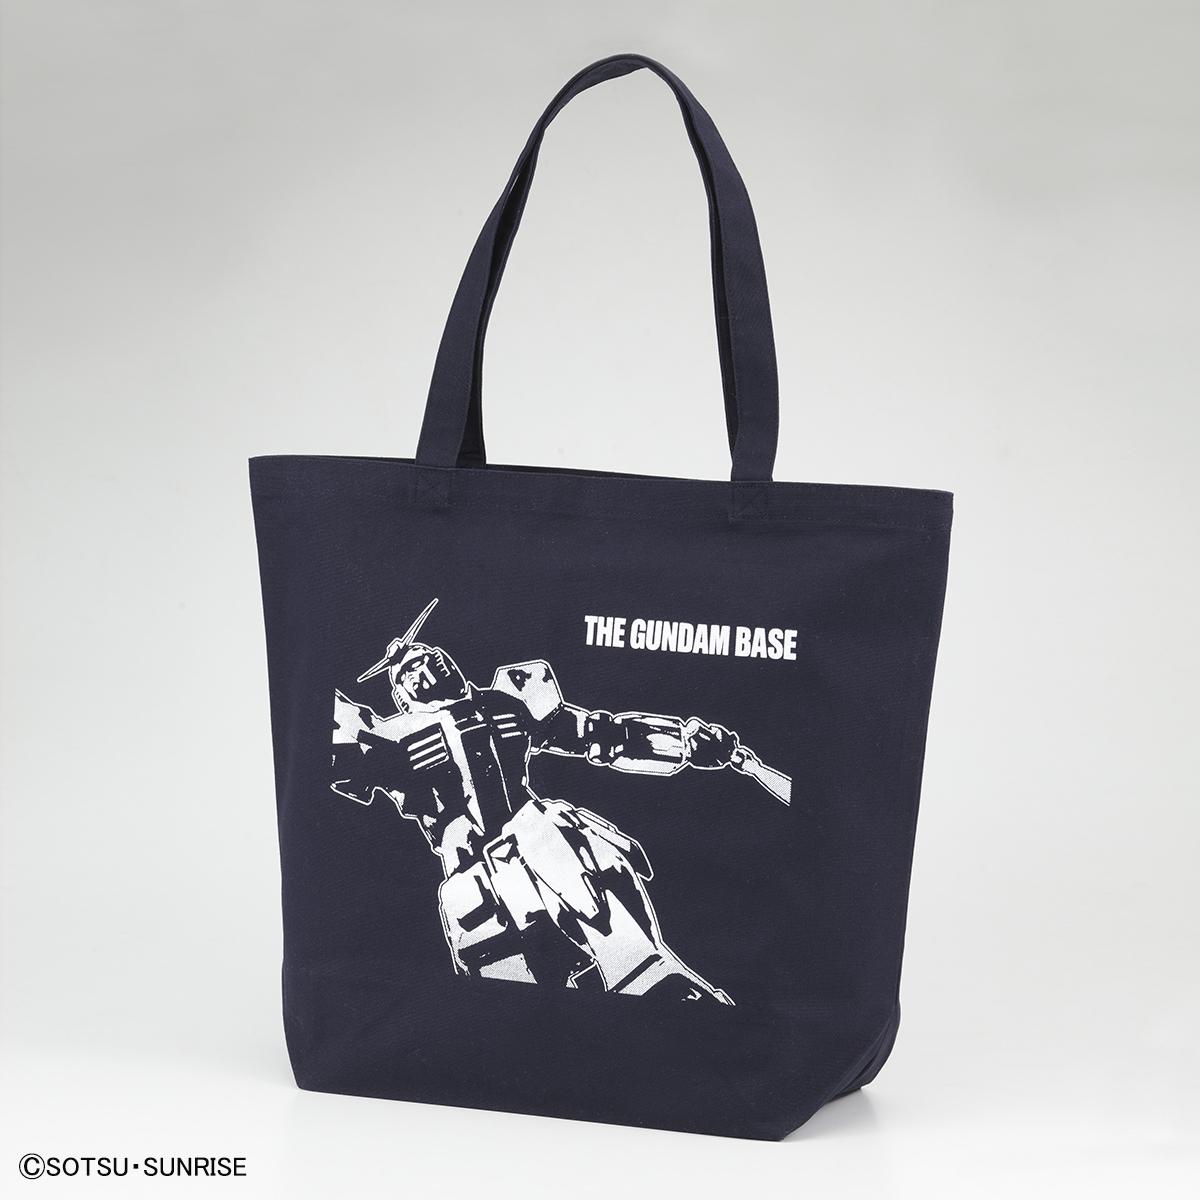 THE GUNDAM BASE トートバック 商品画像